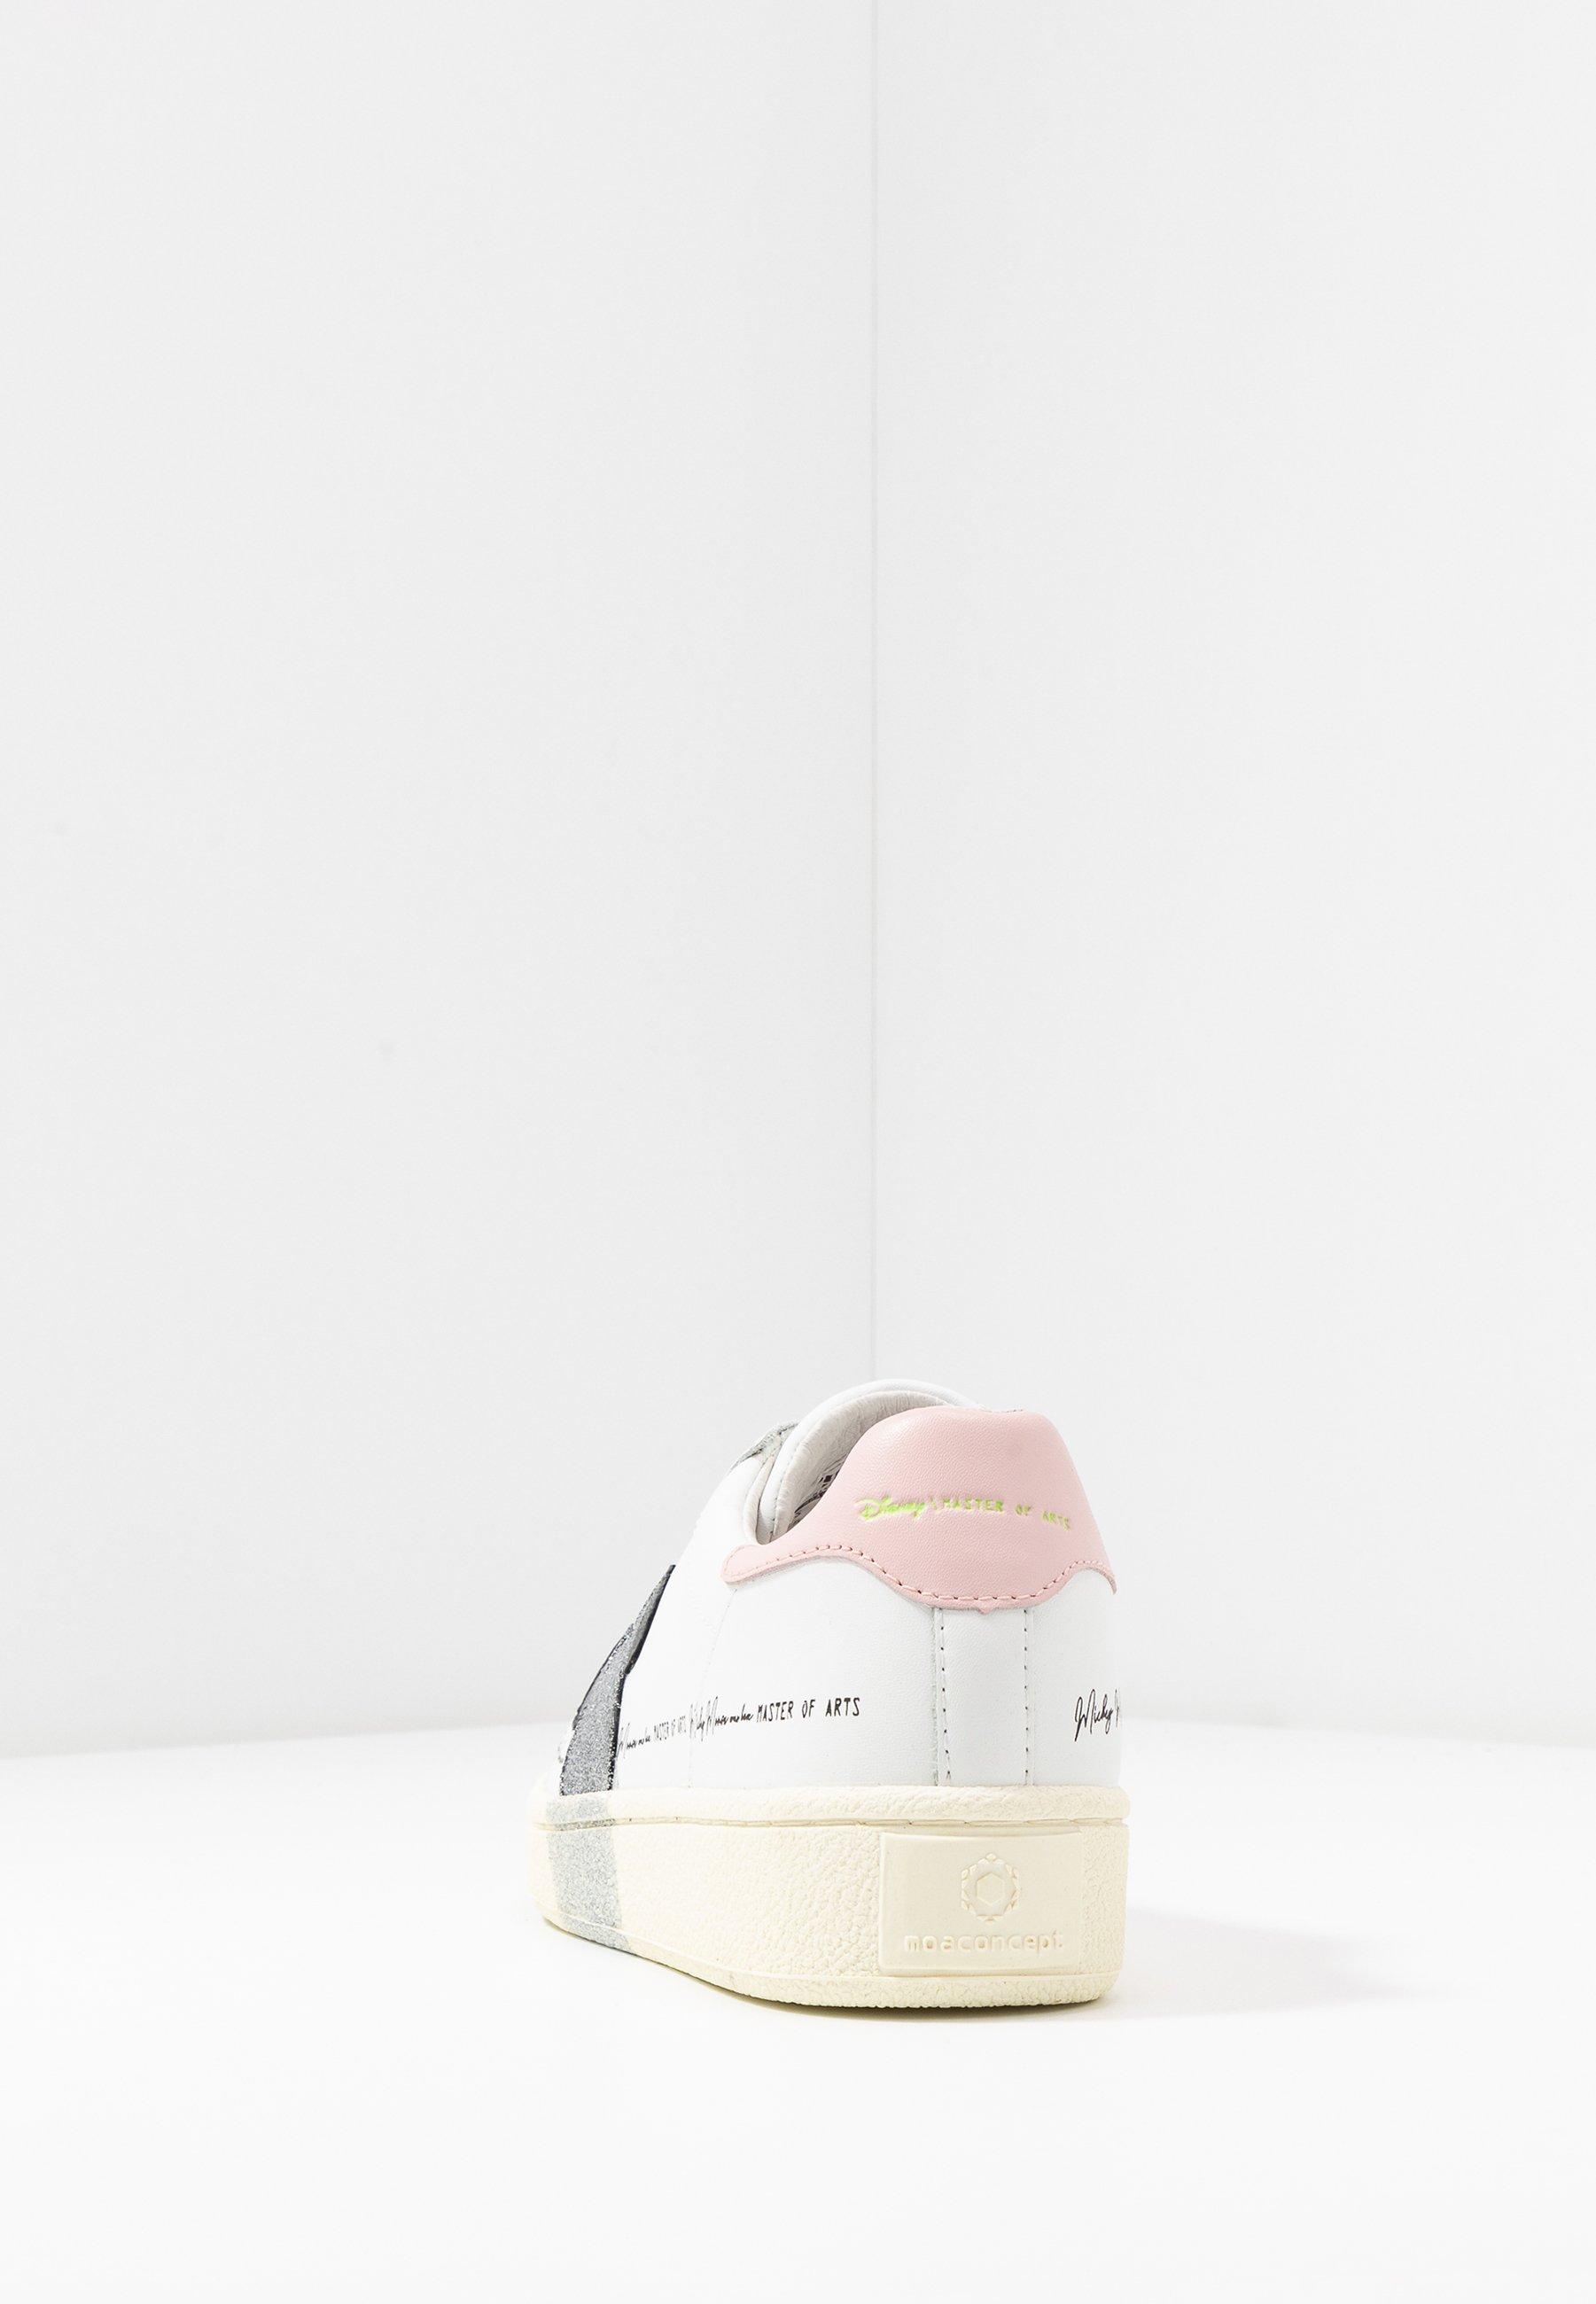 Moa - Master Of Arts Grand White Silver Glitter Sneakers White/silver